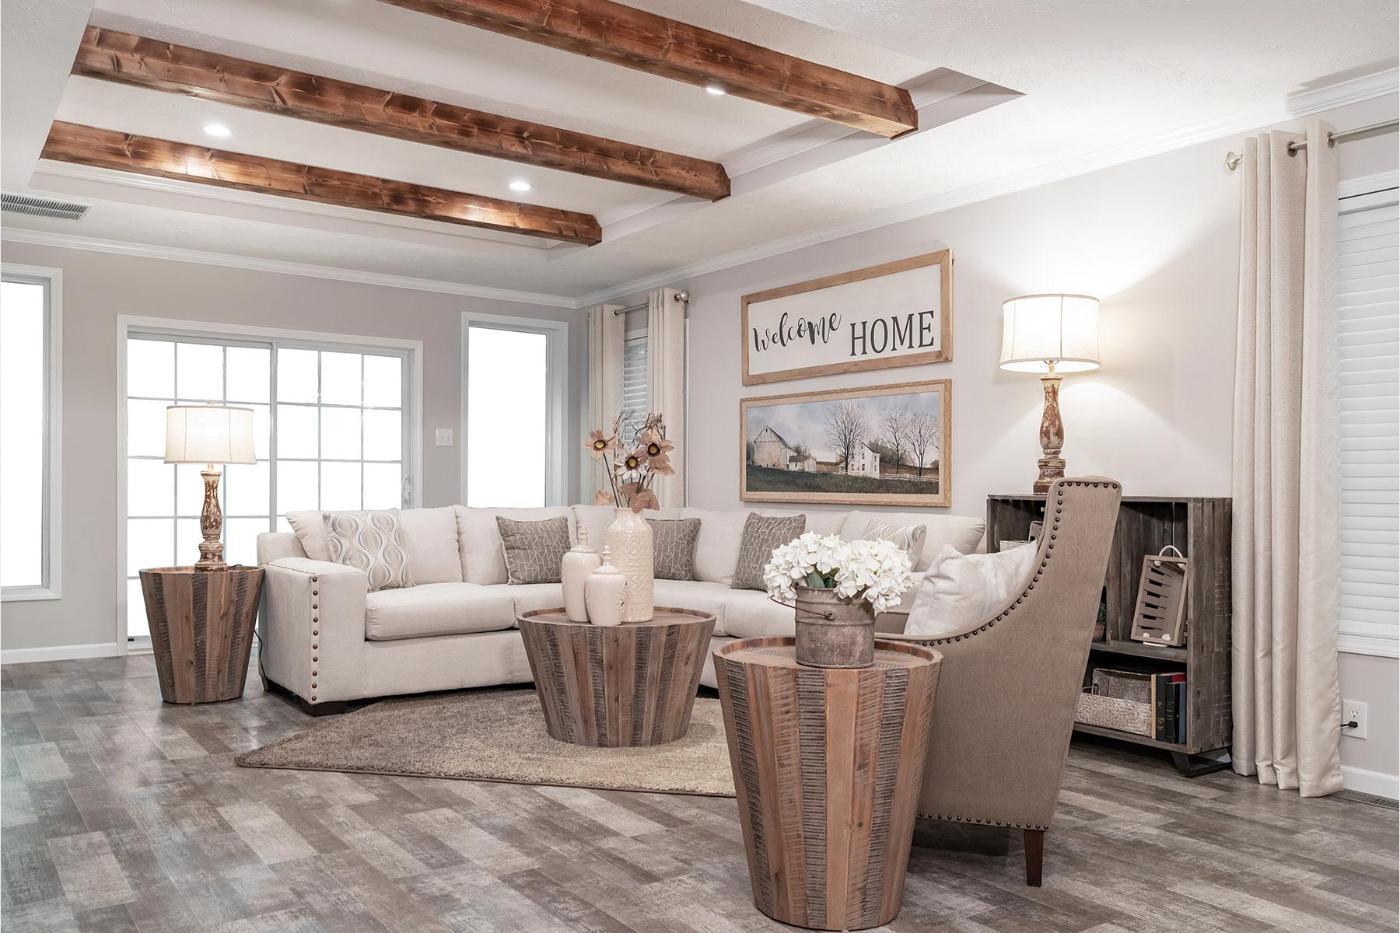 The Ridgecrest Living Room